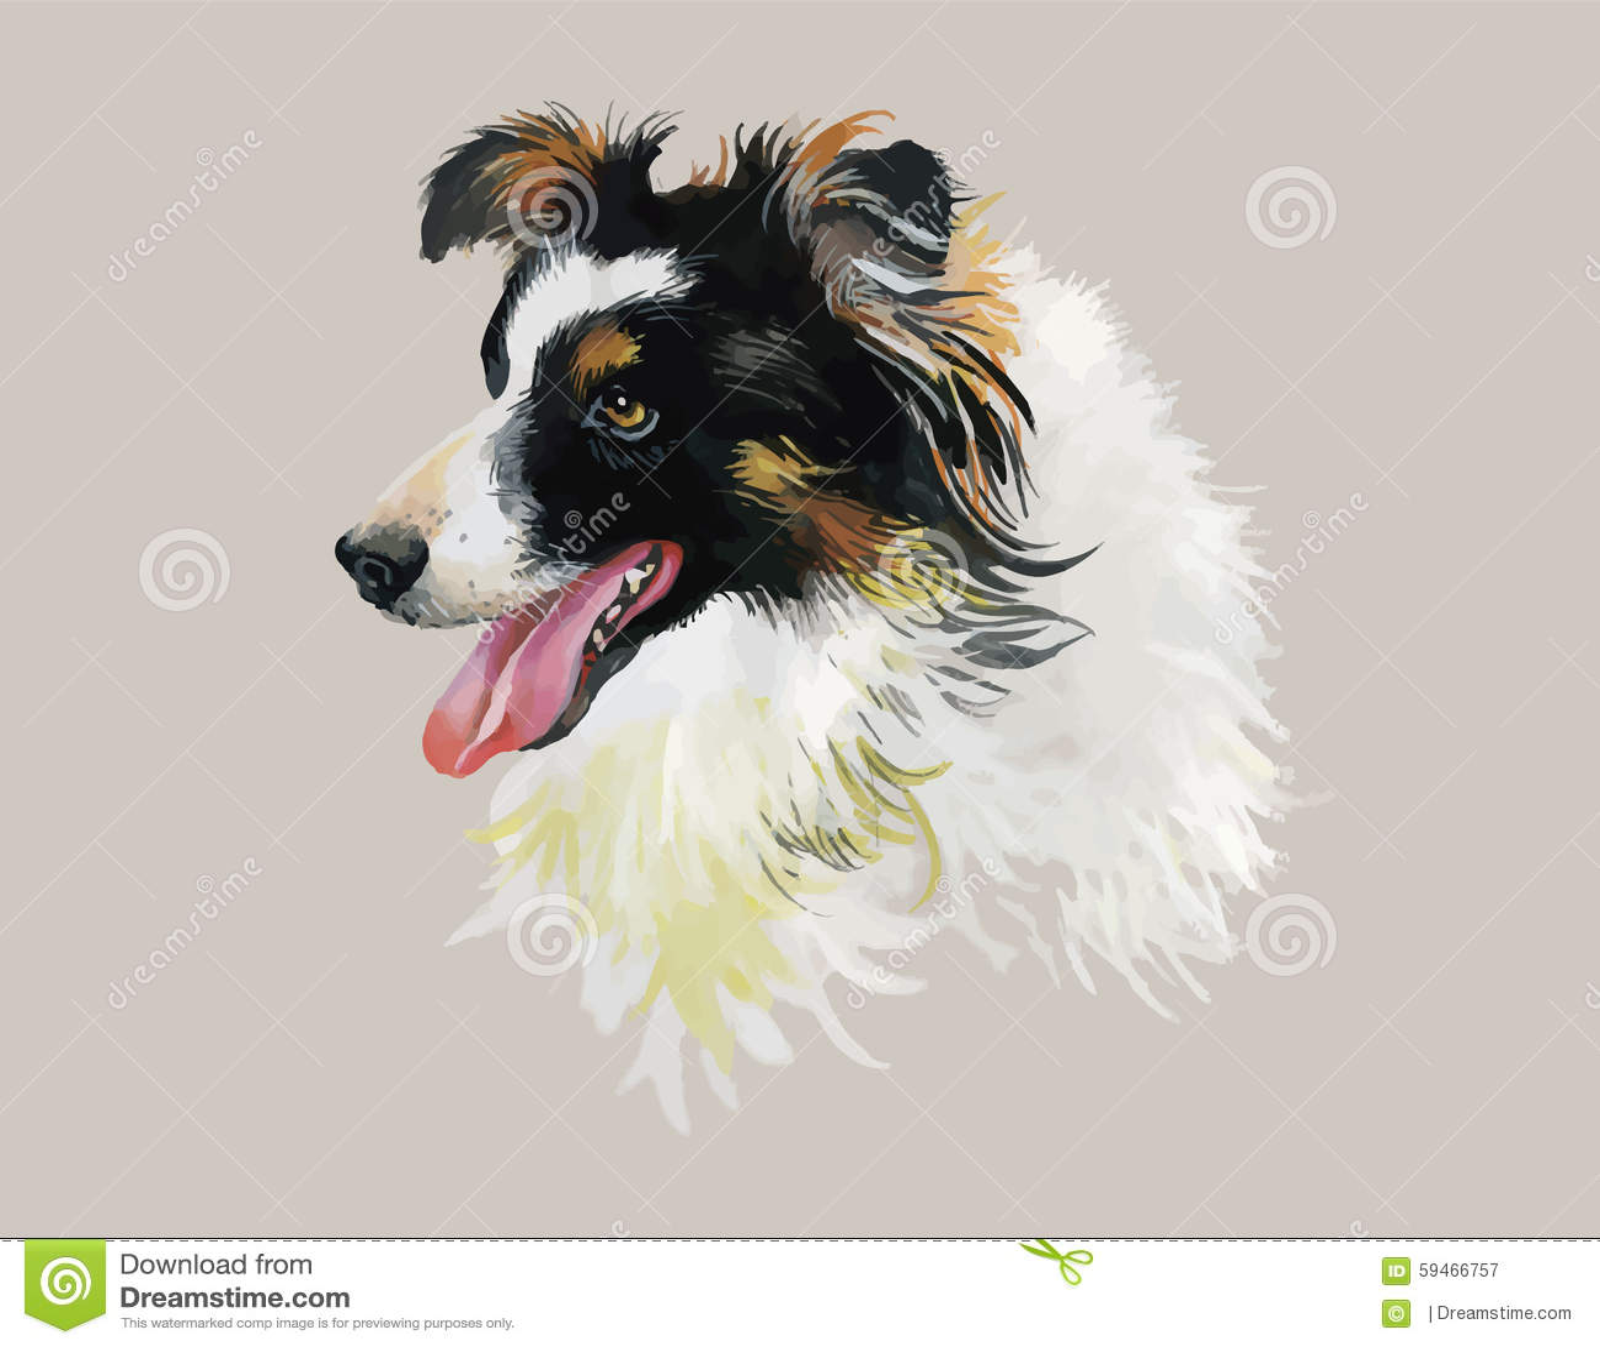 border collie animal dog watercolor illustration on white